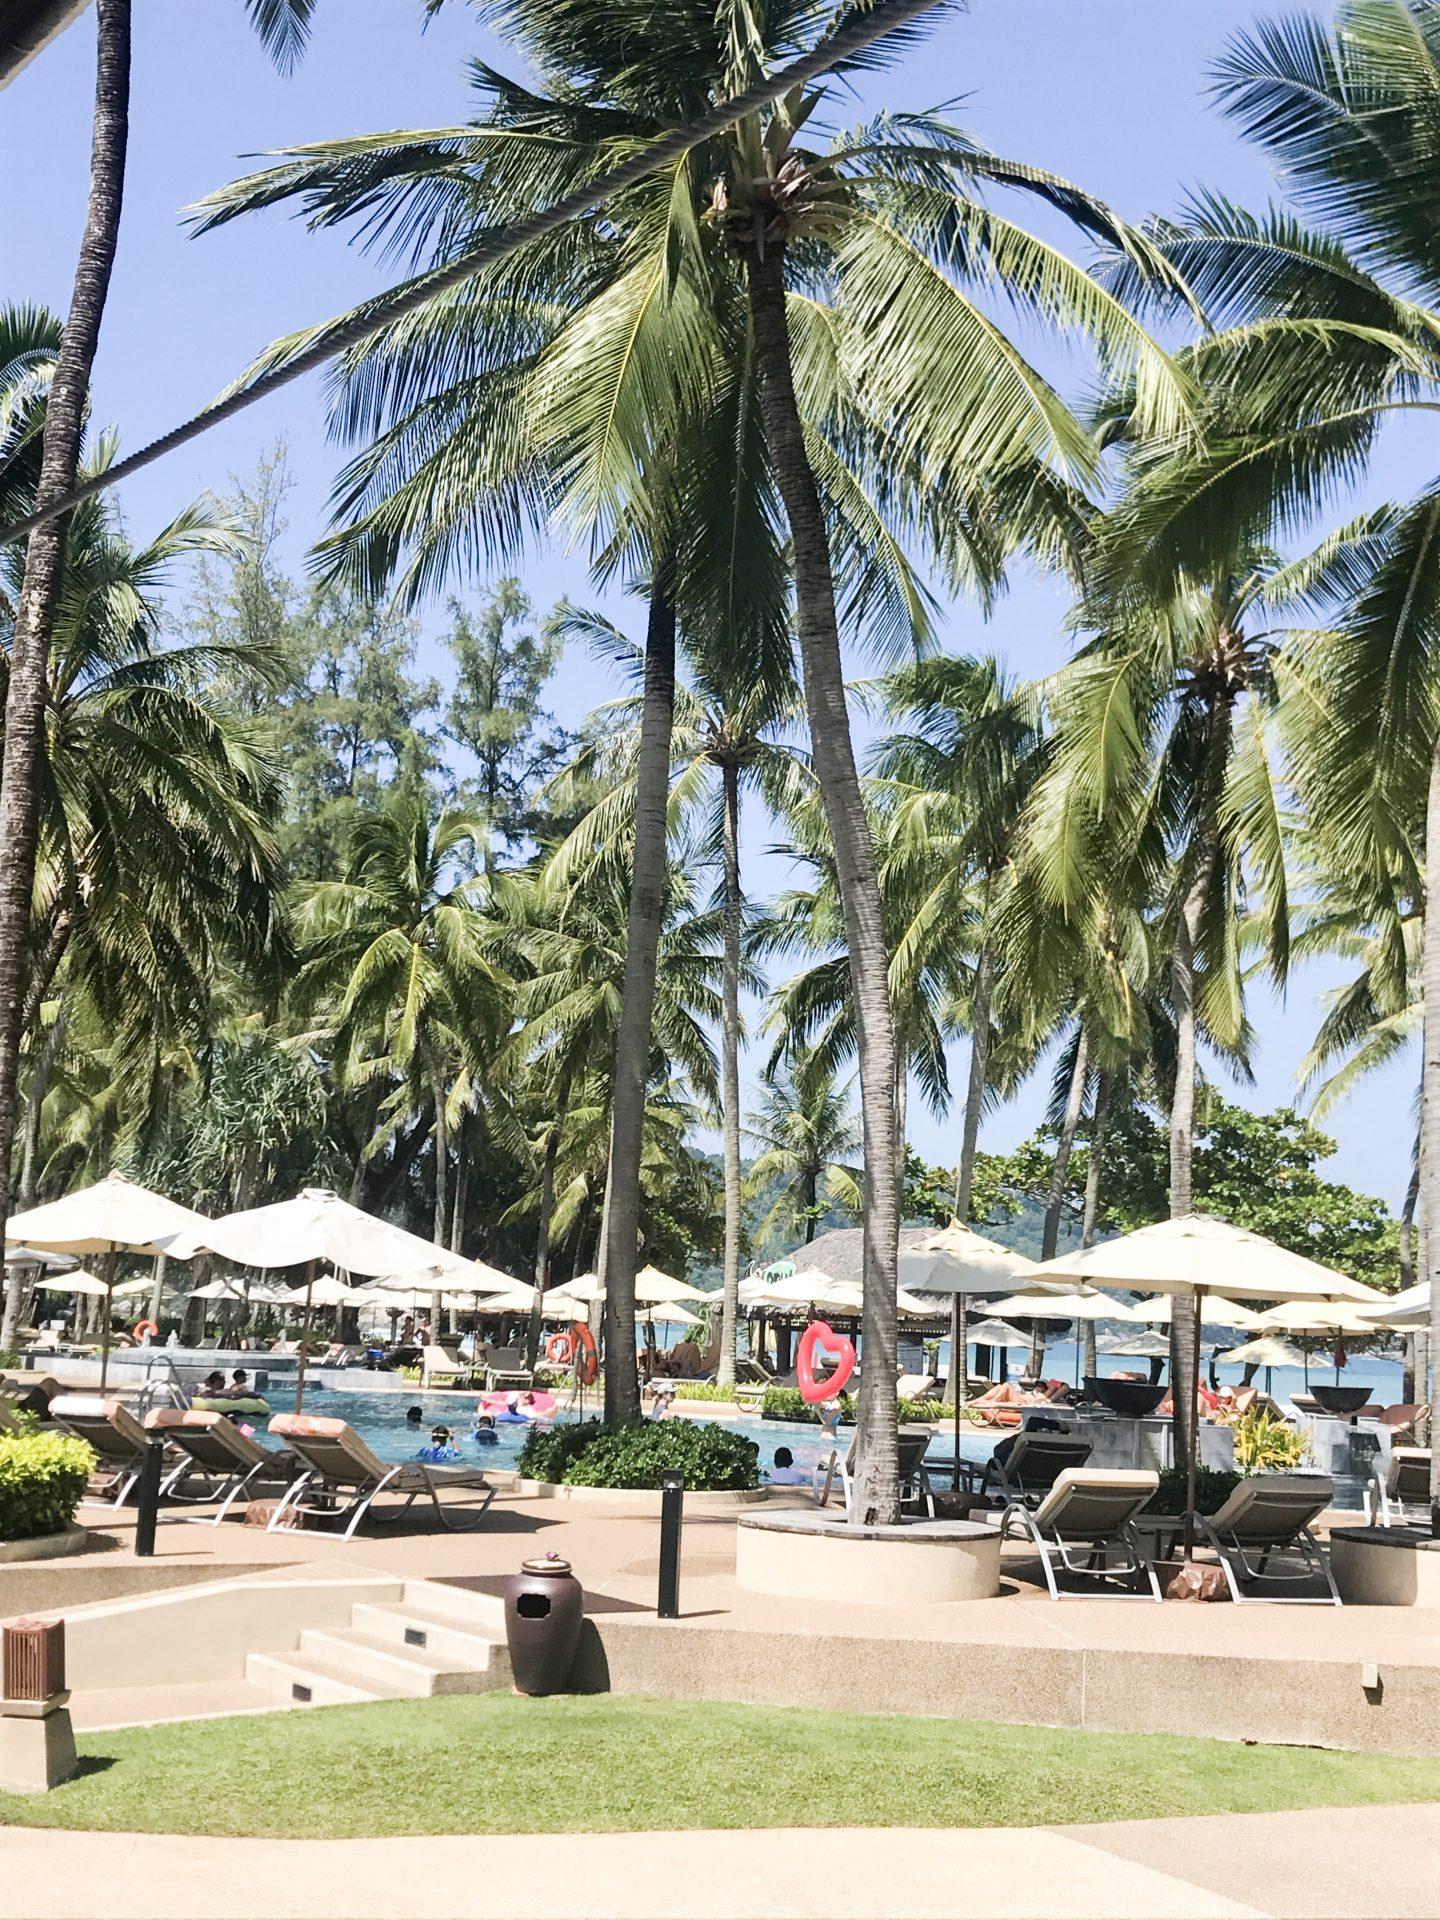 Phuket Katathani Beach Resort - Lovelycatification